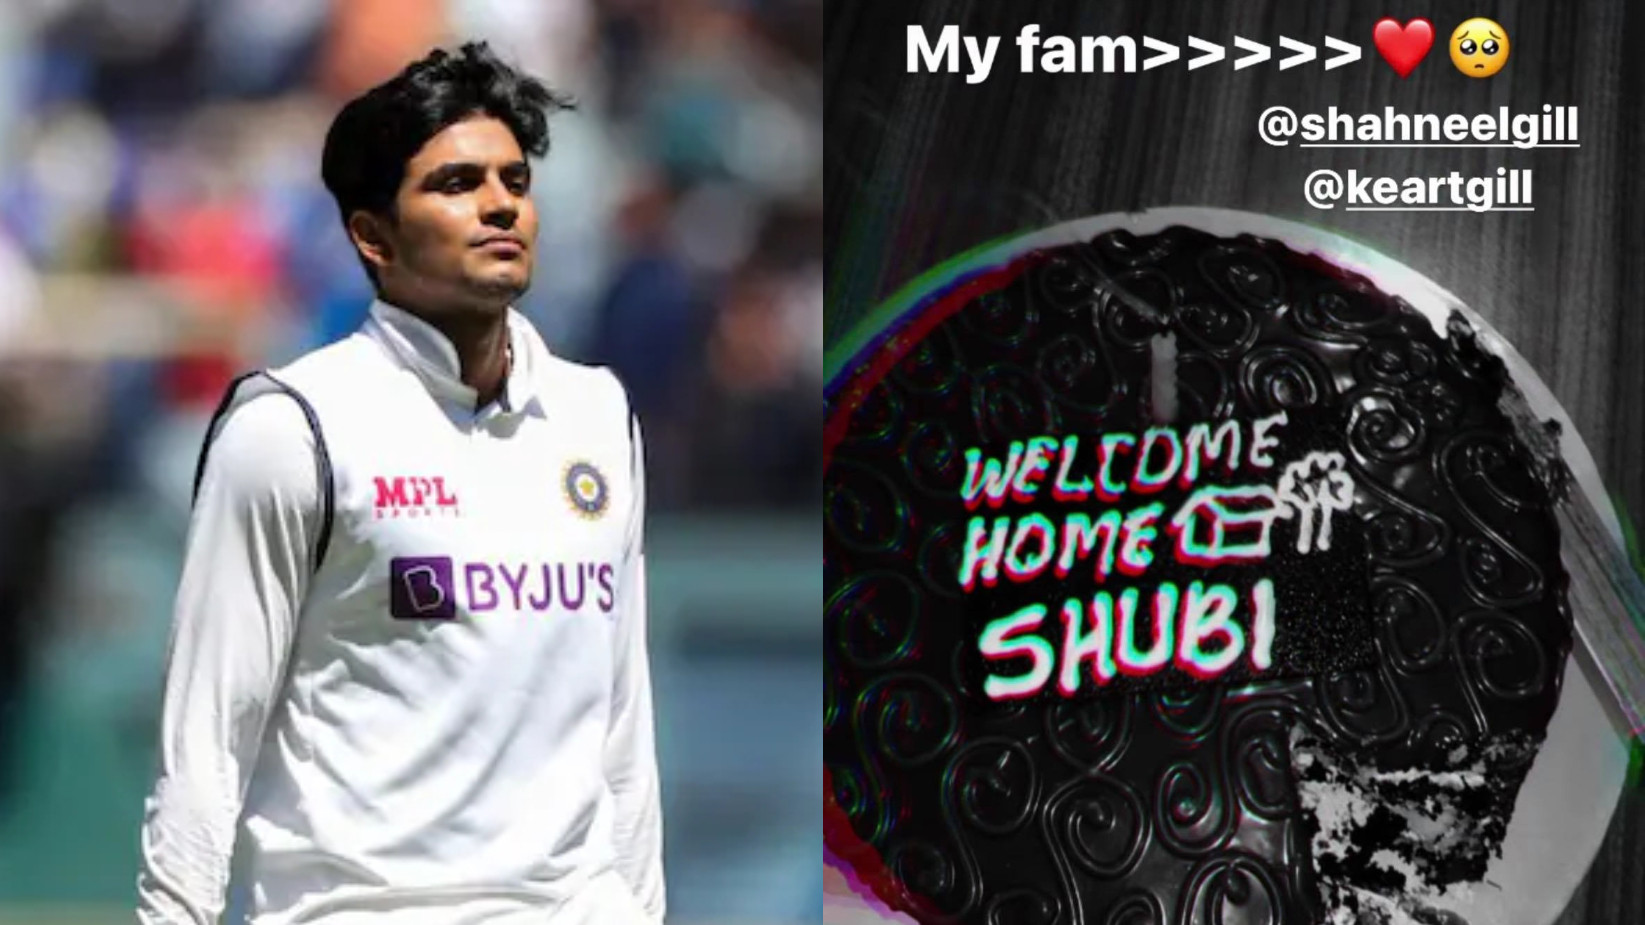 ENG v IND 2021: Shubman Gill's Instagram stories indicate he's back home